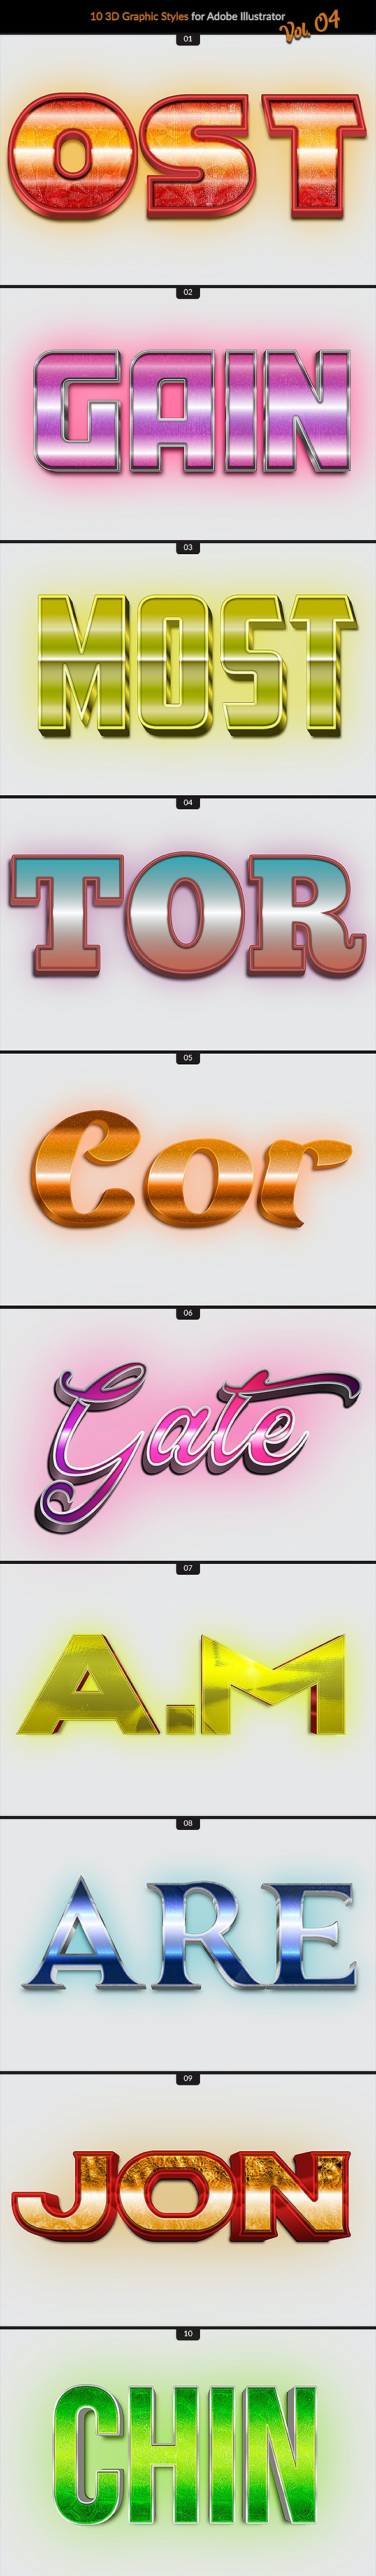 10 3D Styles vol. 04 - Styles Illustrator